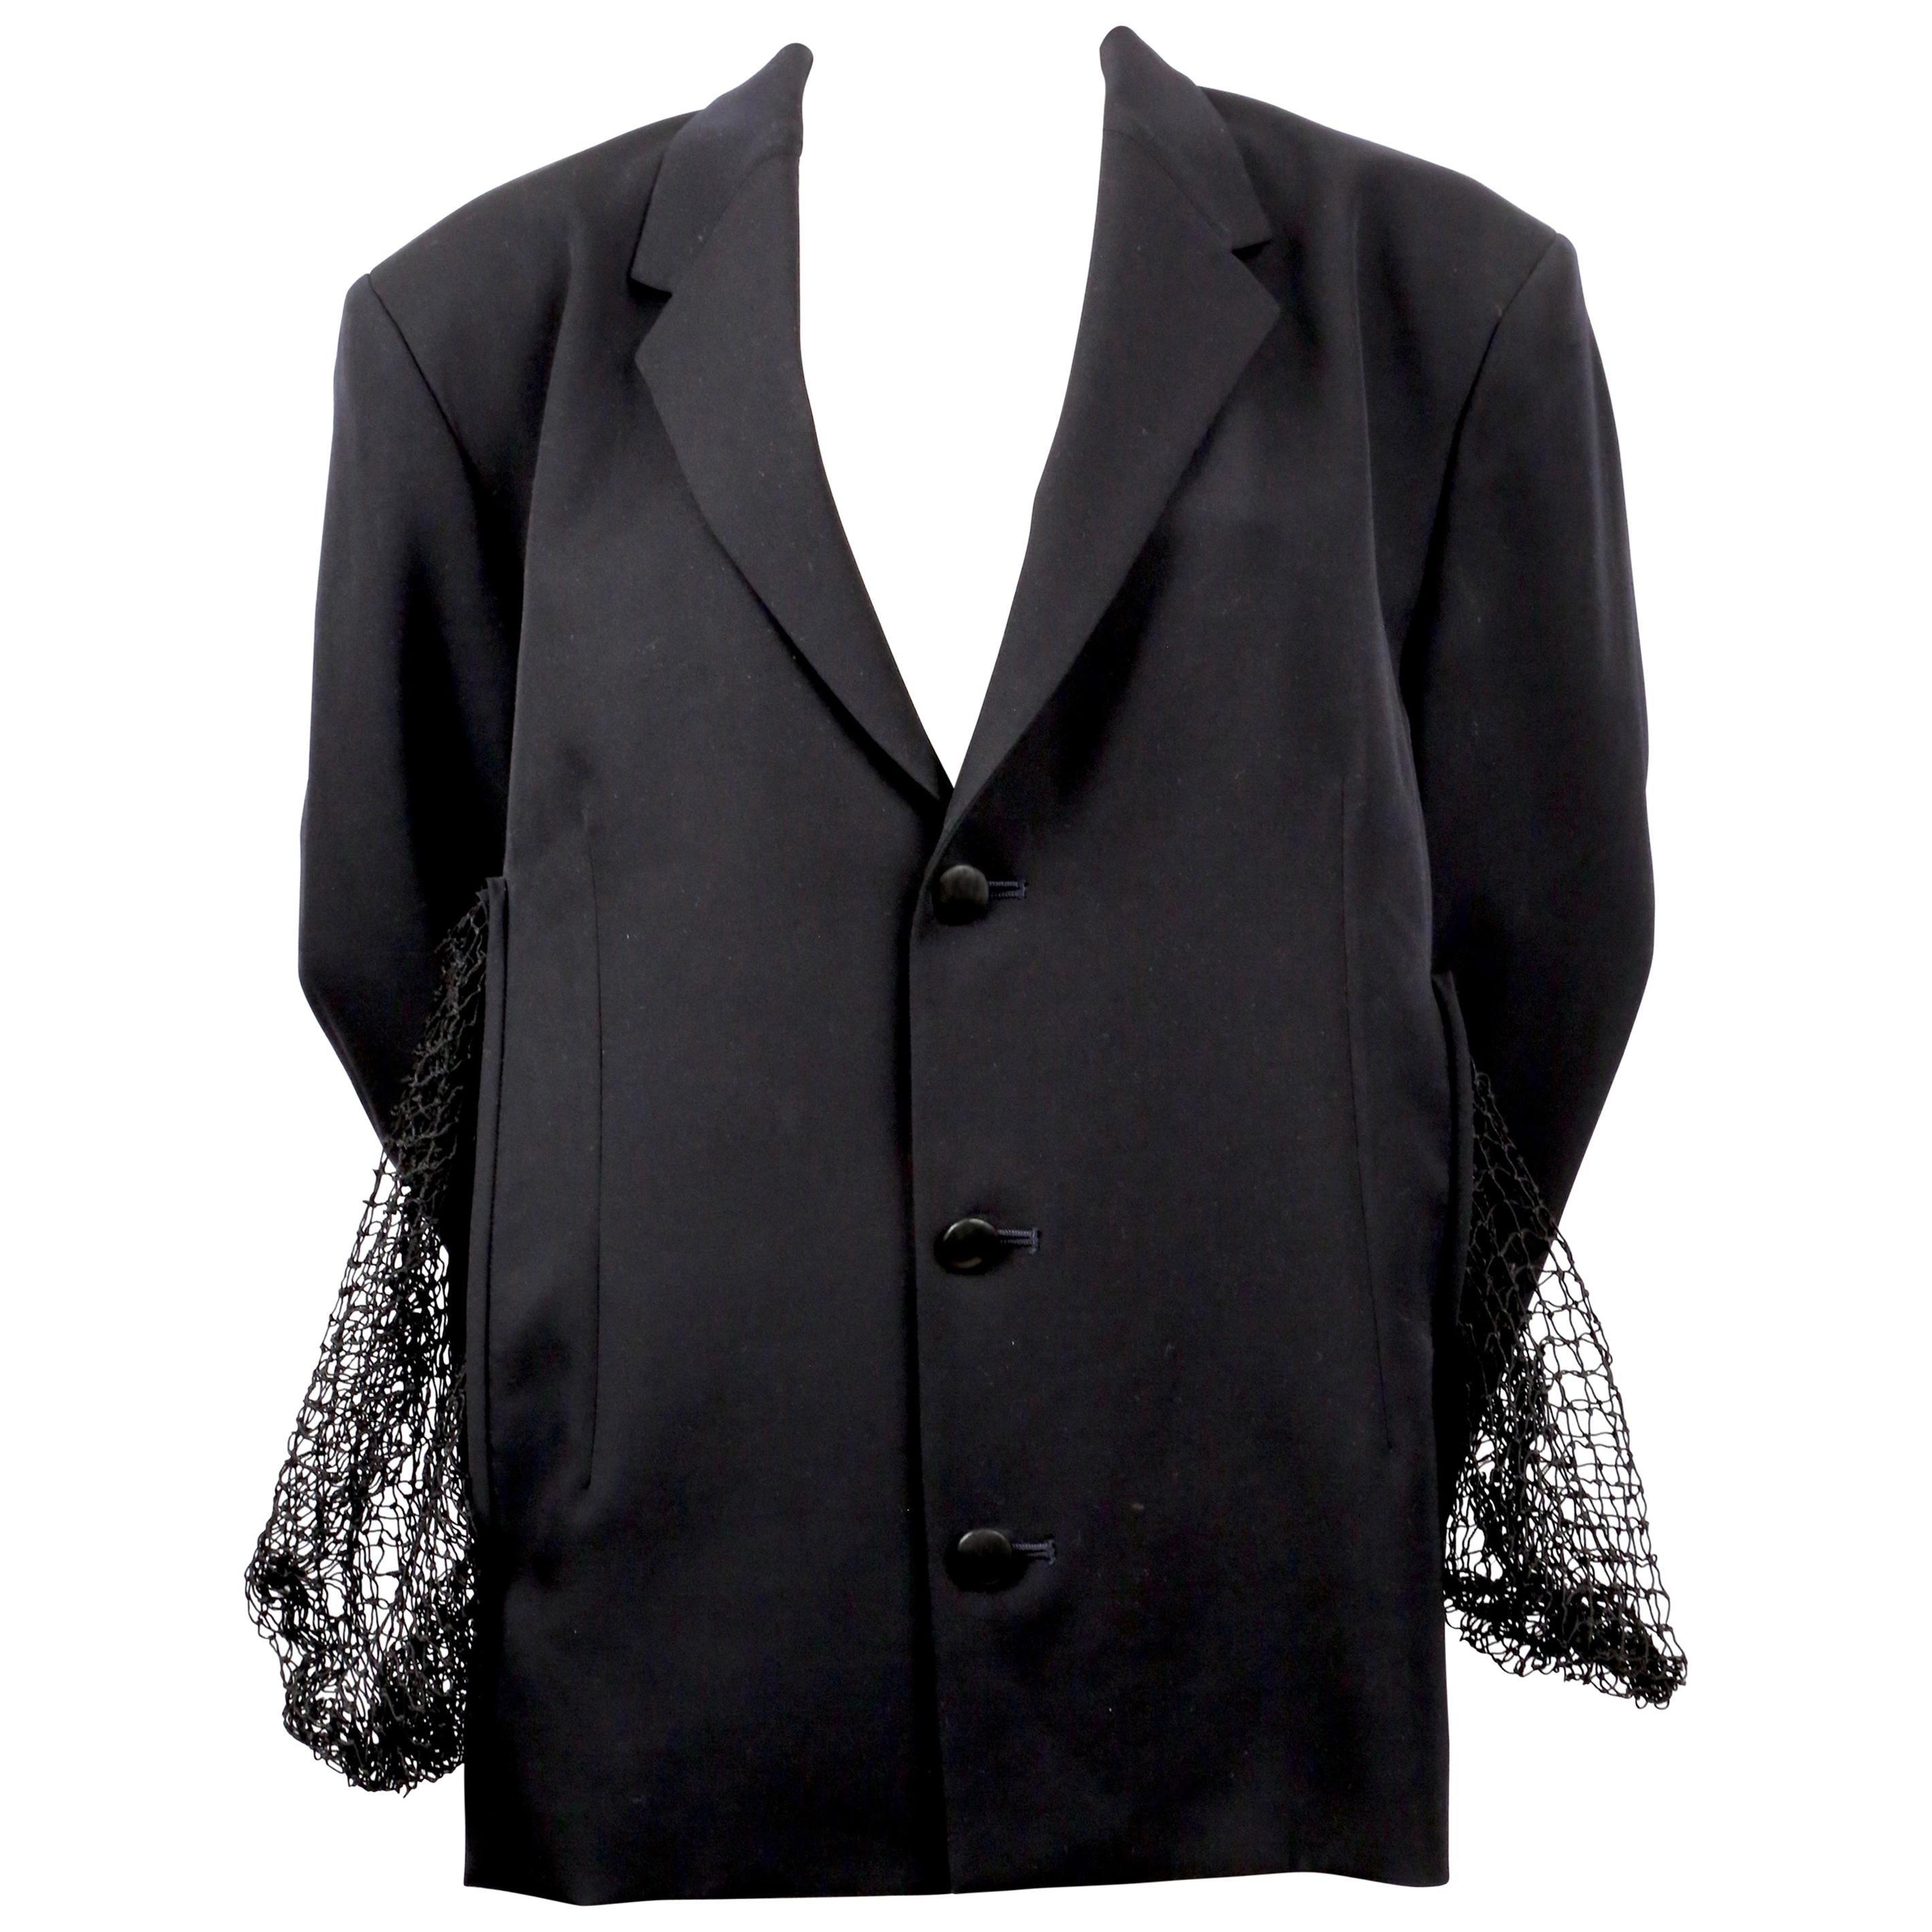 1980's YOHJI YAMAMOTO dark navy blue wool jacket with fishnet pockets